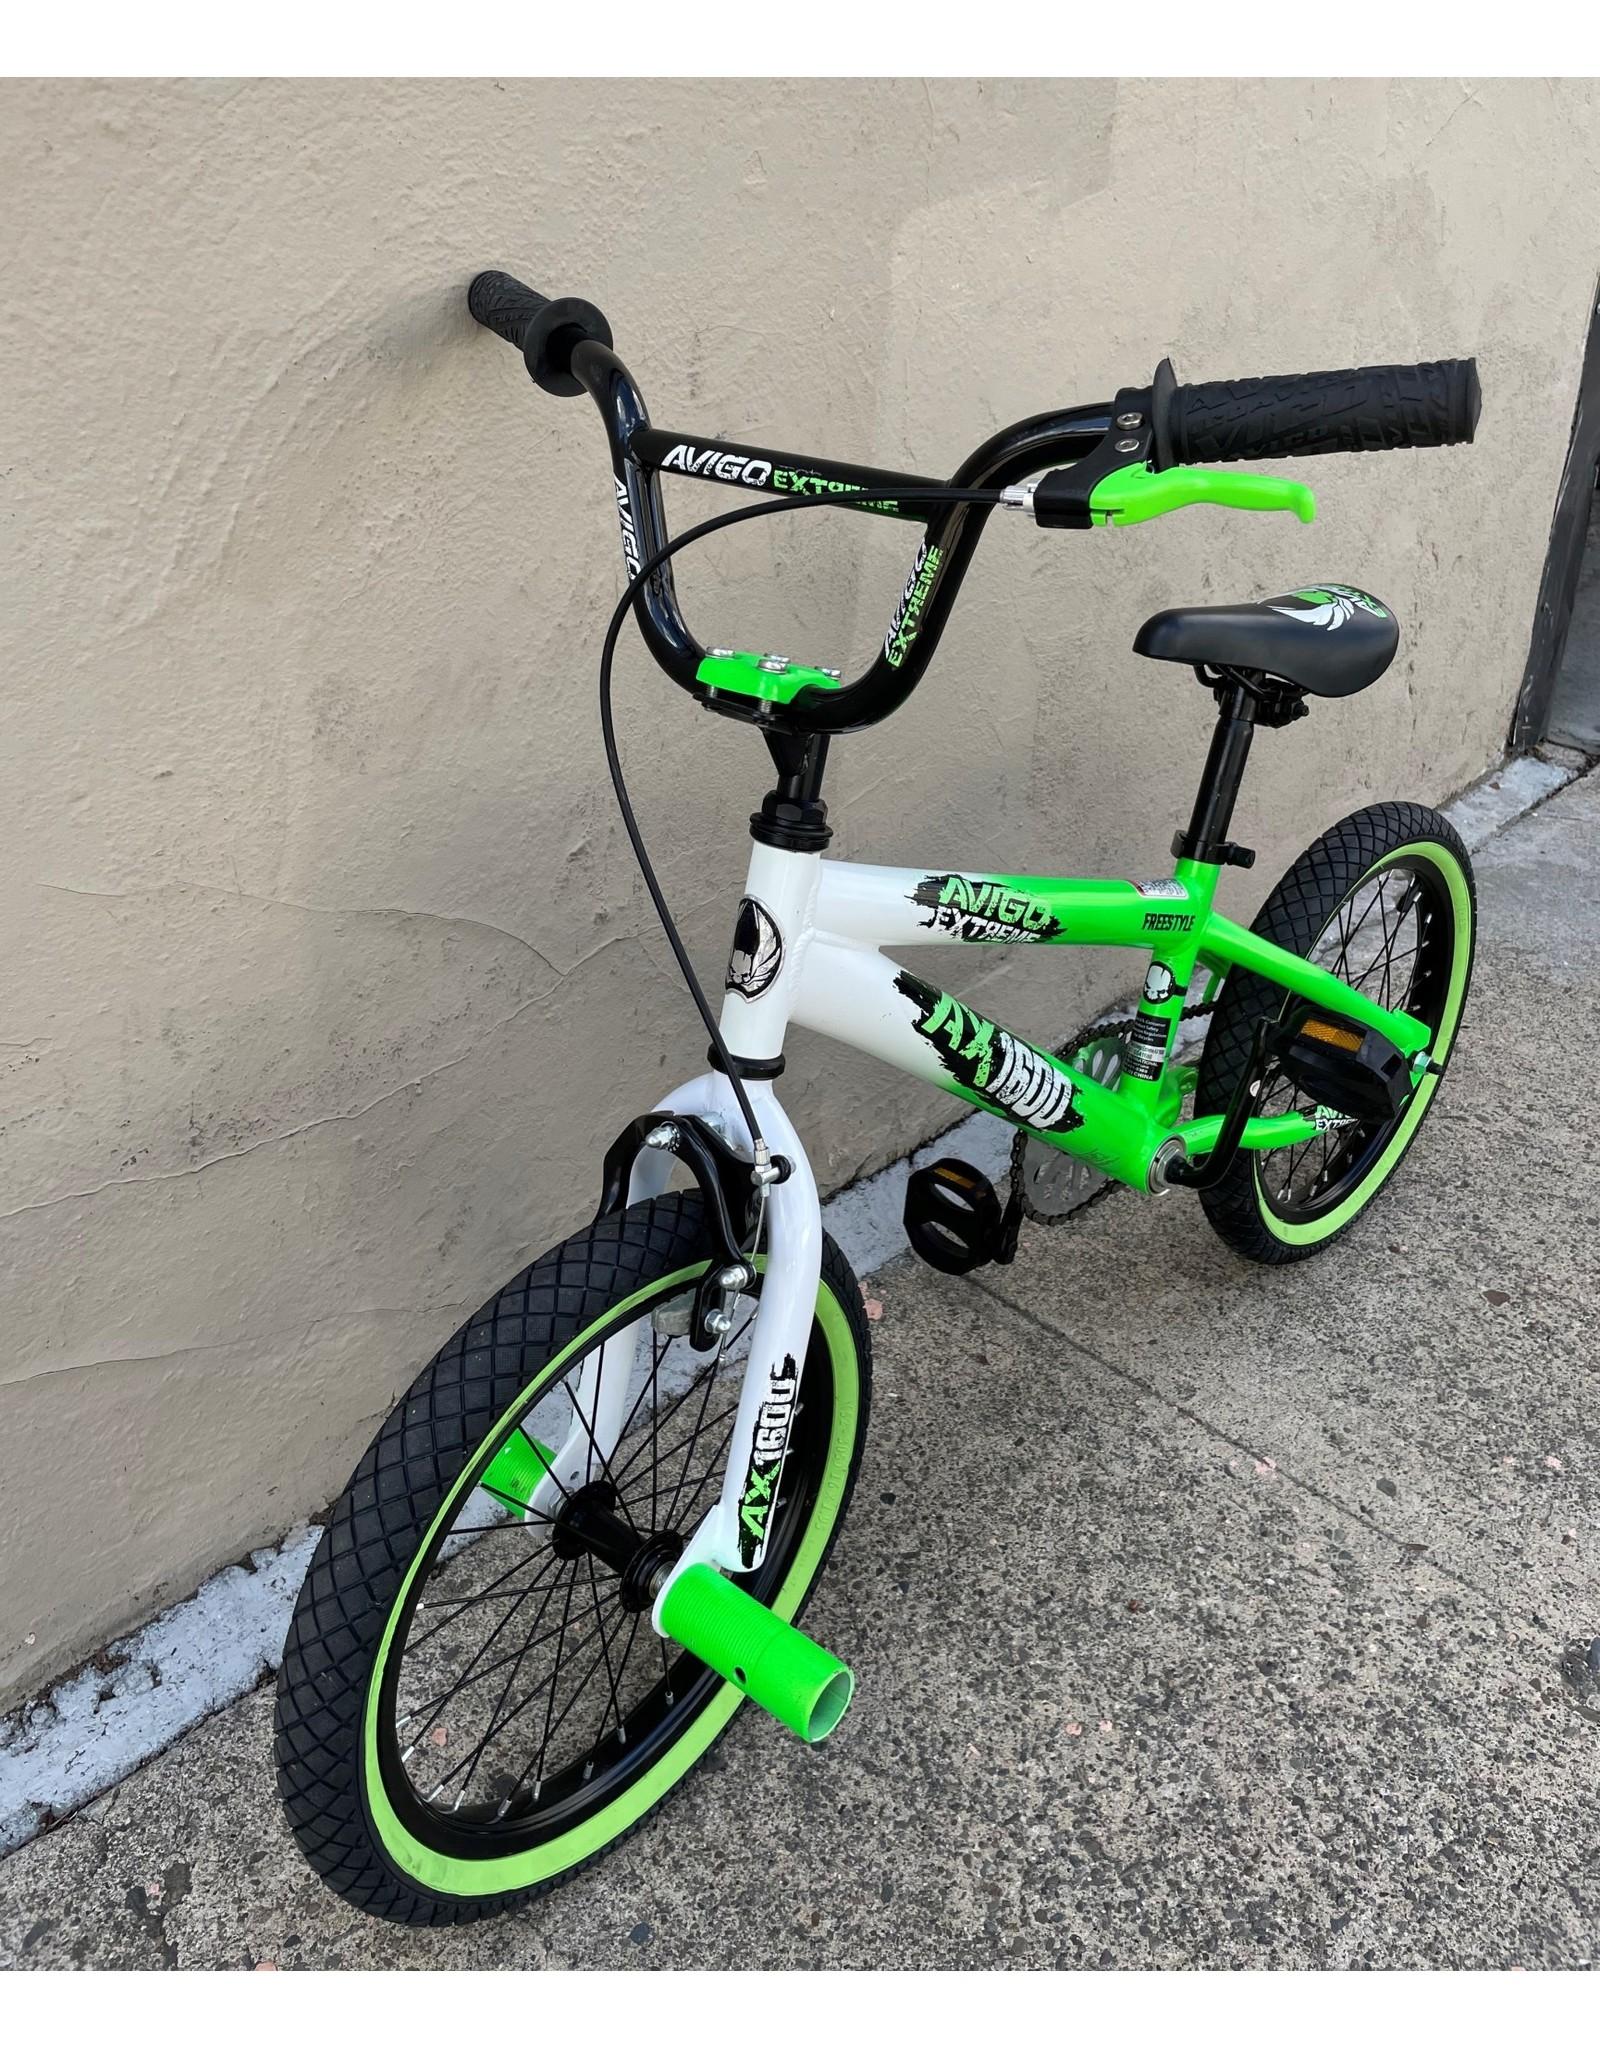 Avigo Avigo Extreme AX 1600 Youth, Green/White,  16-inch wheel